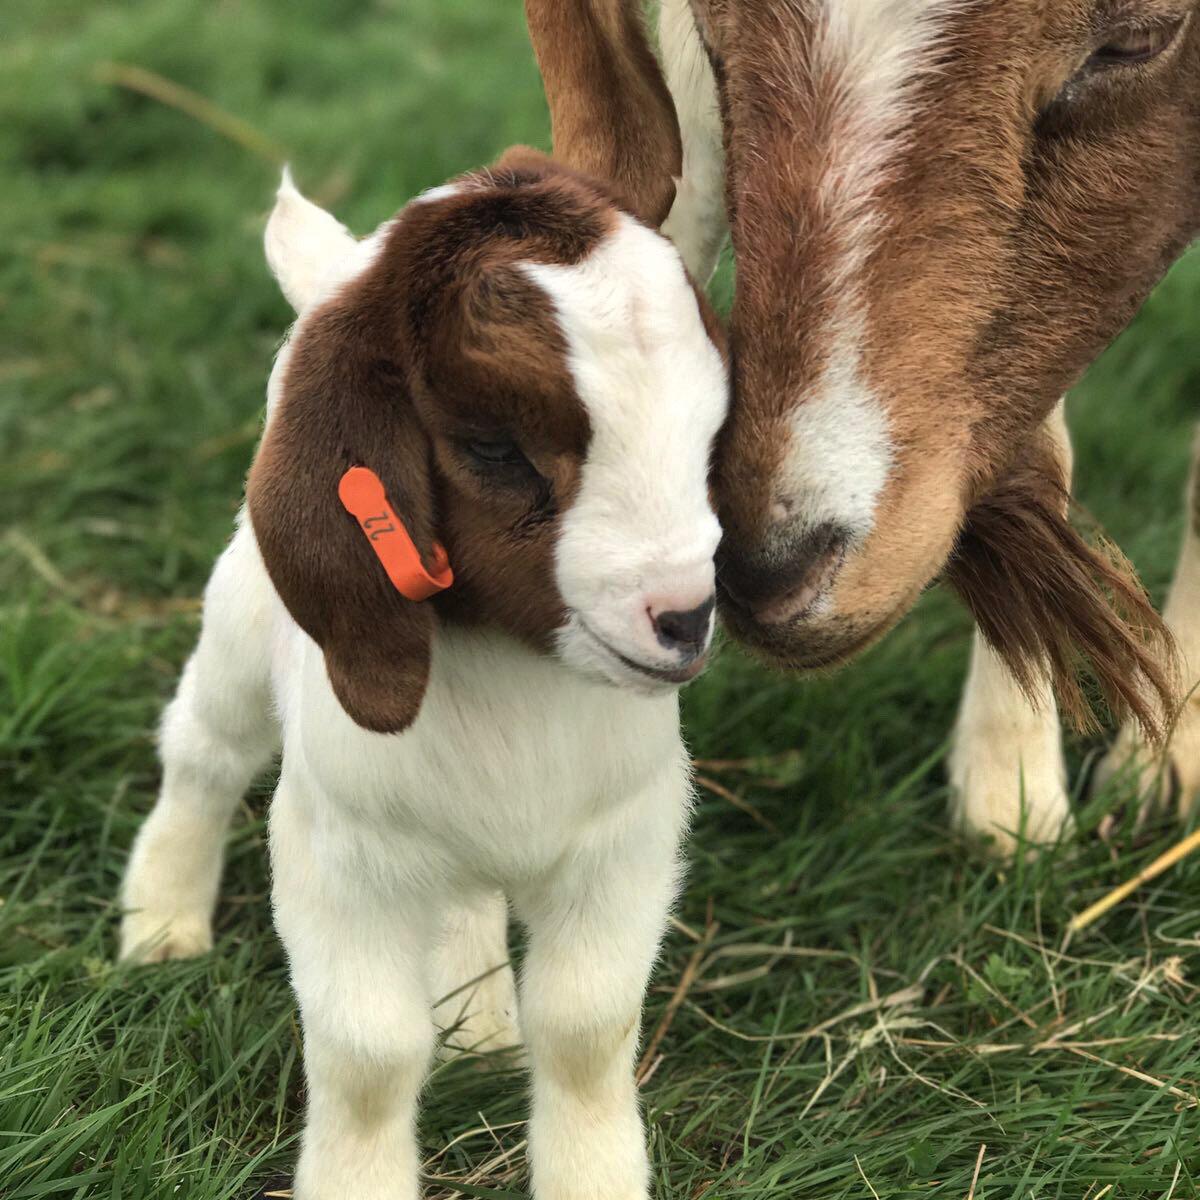 Baby Goat Secret Valley.jpg